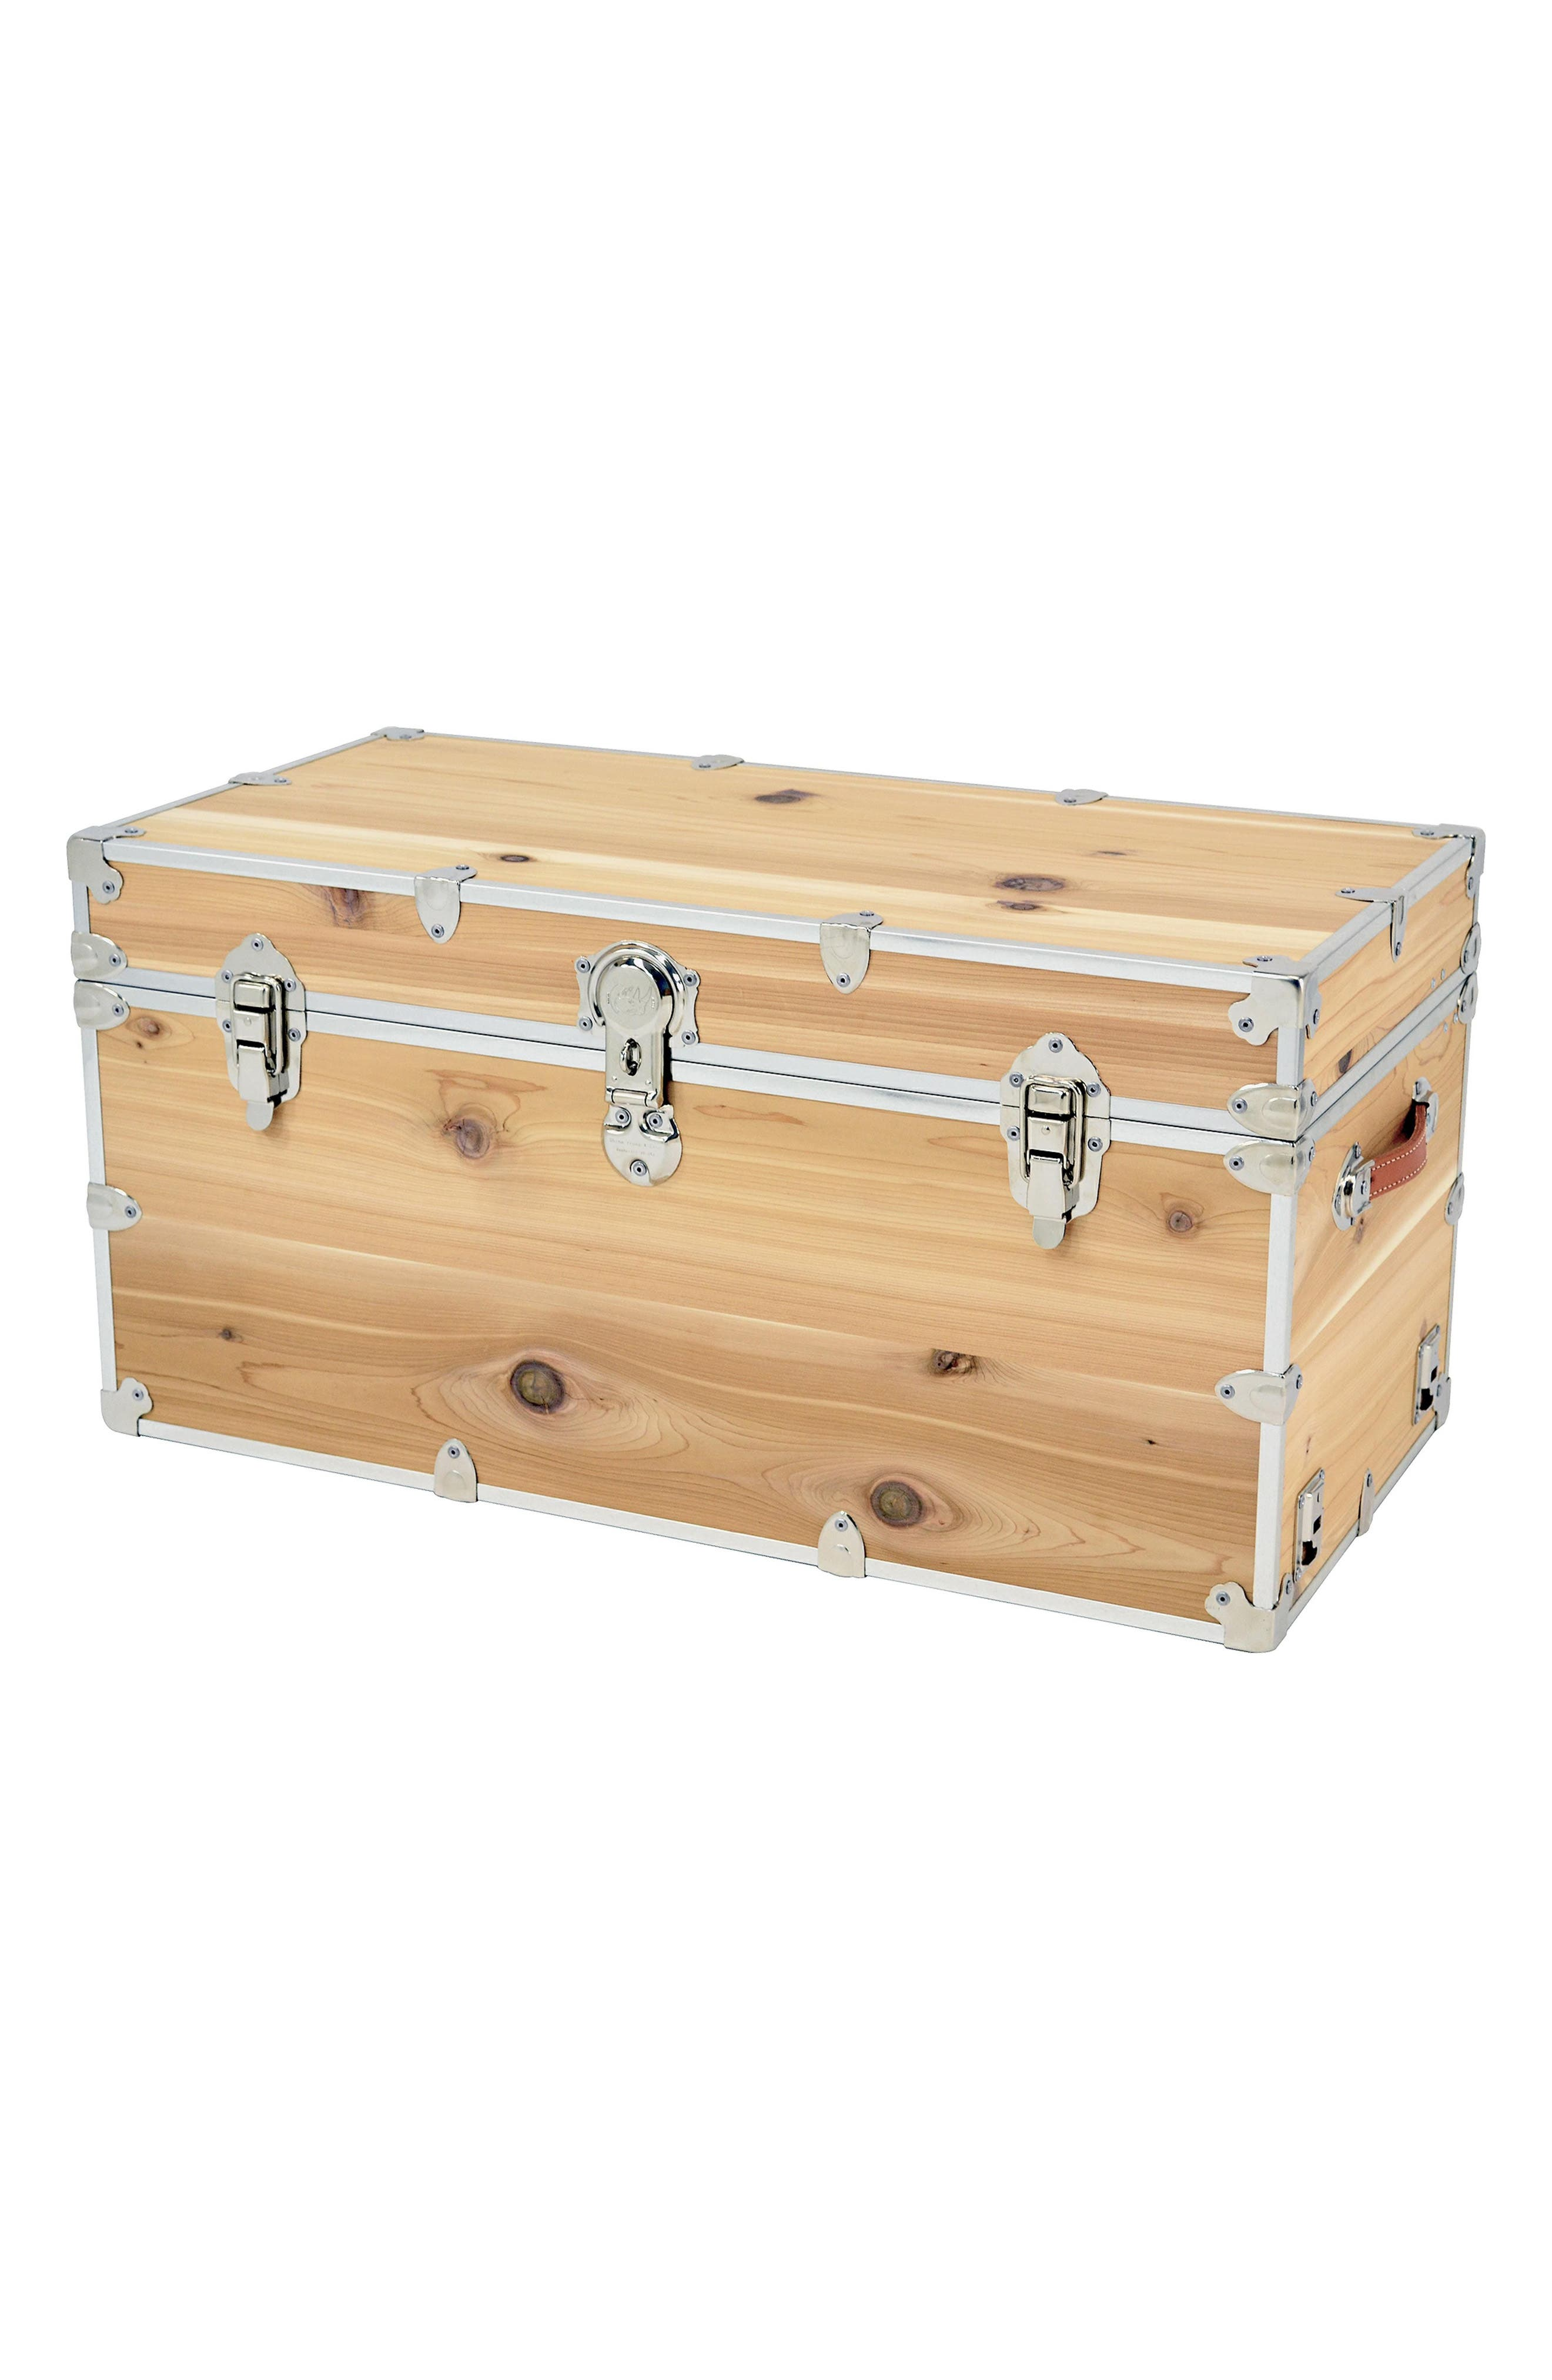 Rhino Trunk & Case XXL Knotty Cedar Cube Trunk,                             Main thumbnail 1, color,                             Wood